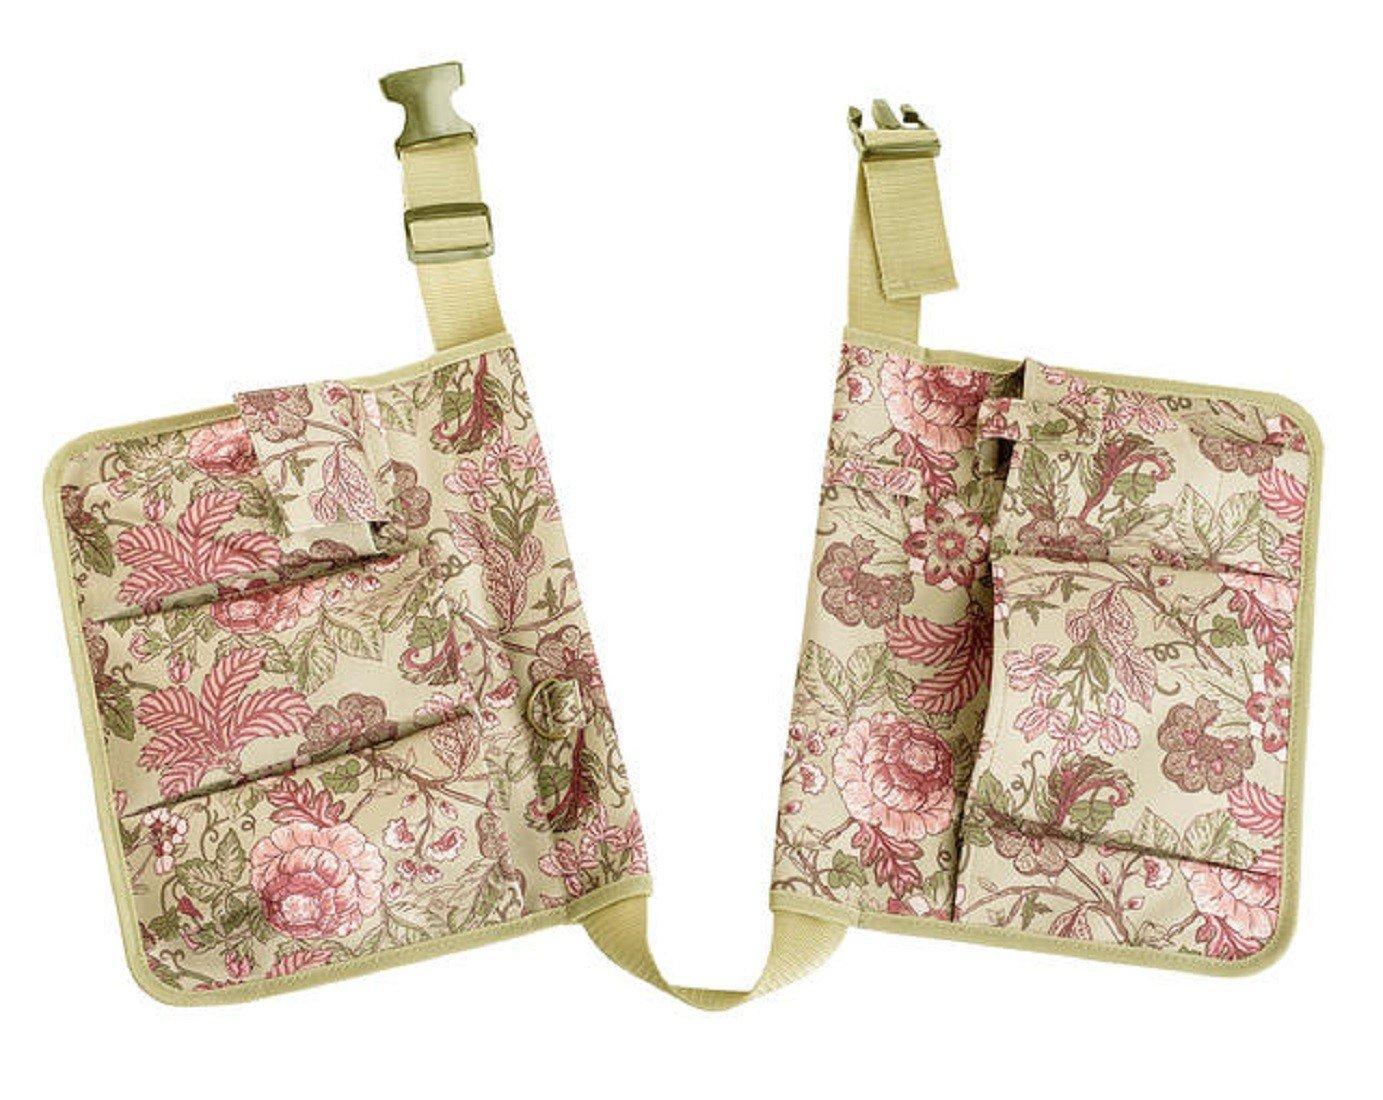 Garden Girl TB30 Chelsea Print Tool Belt - Green/Plum/Pink GardenGirl AB